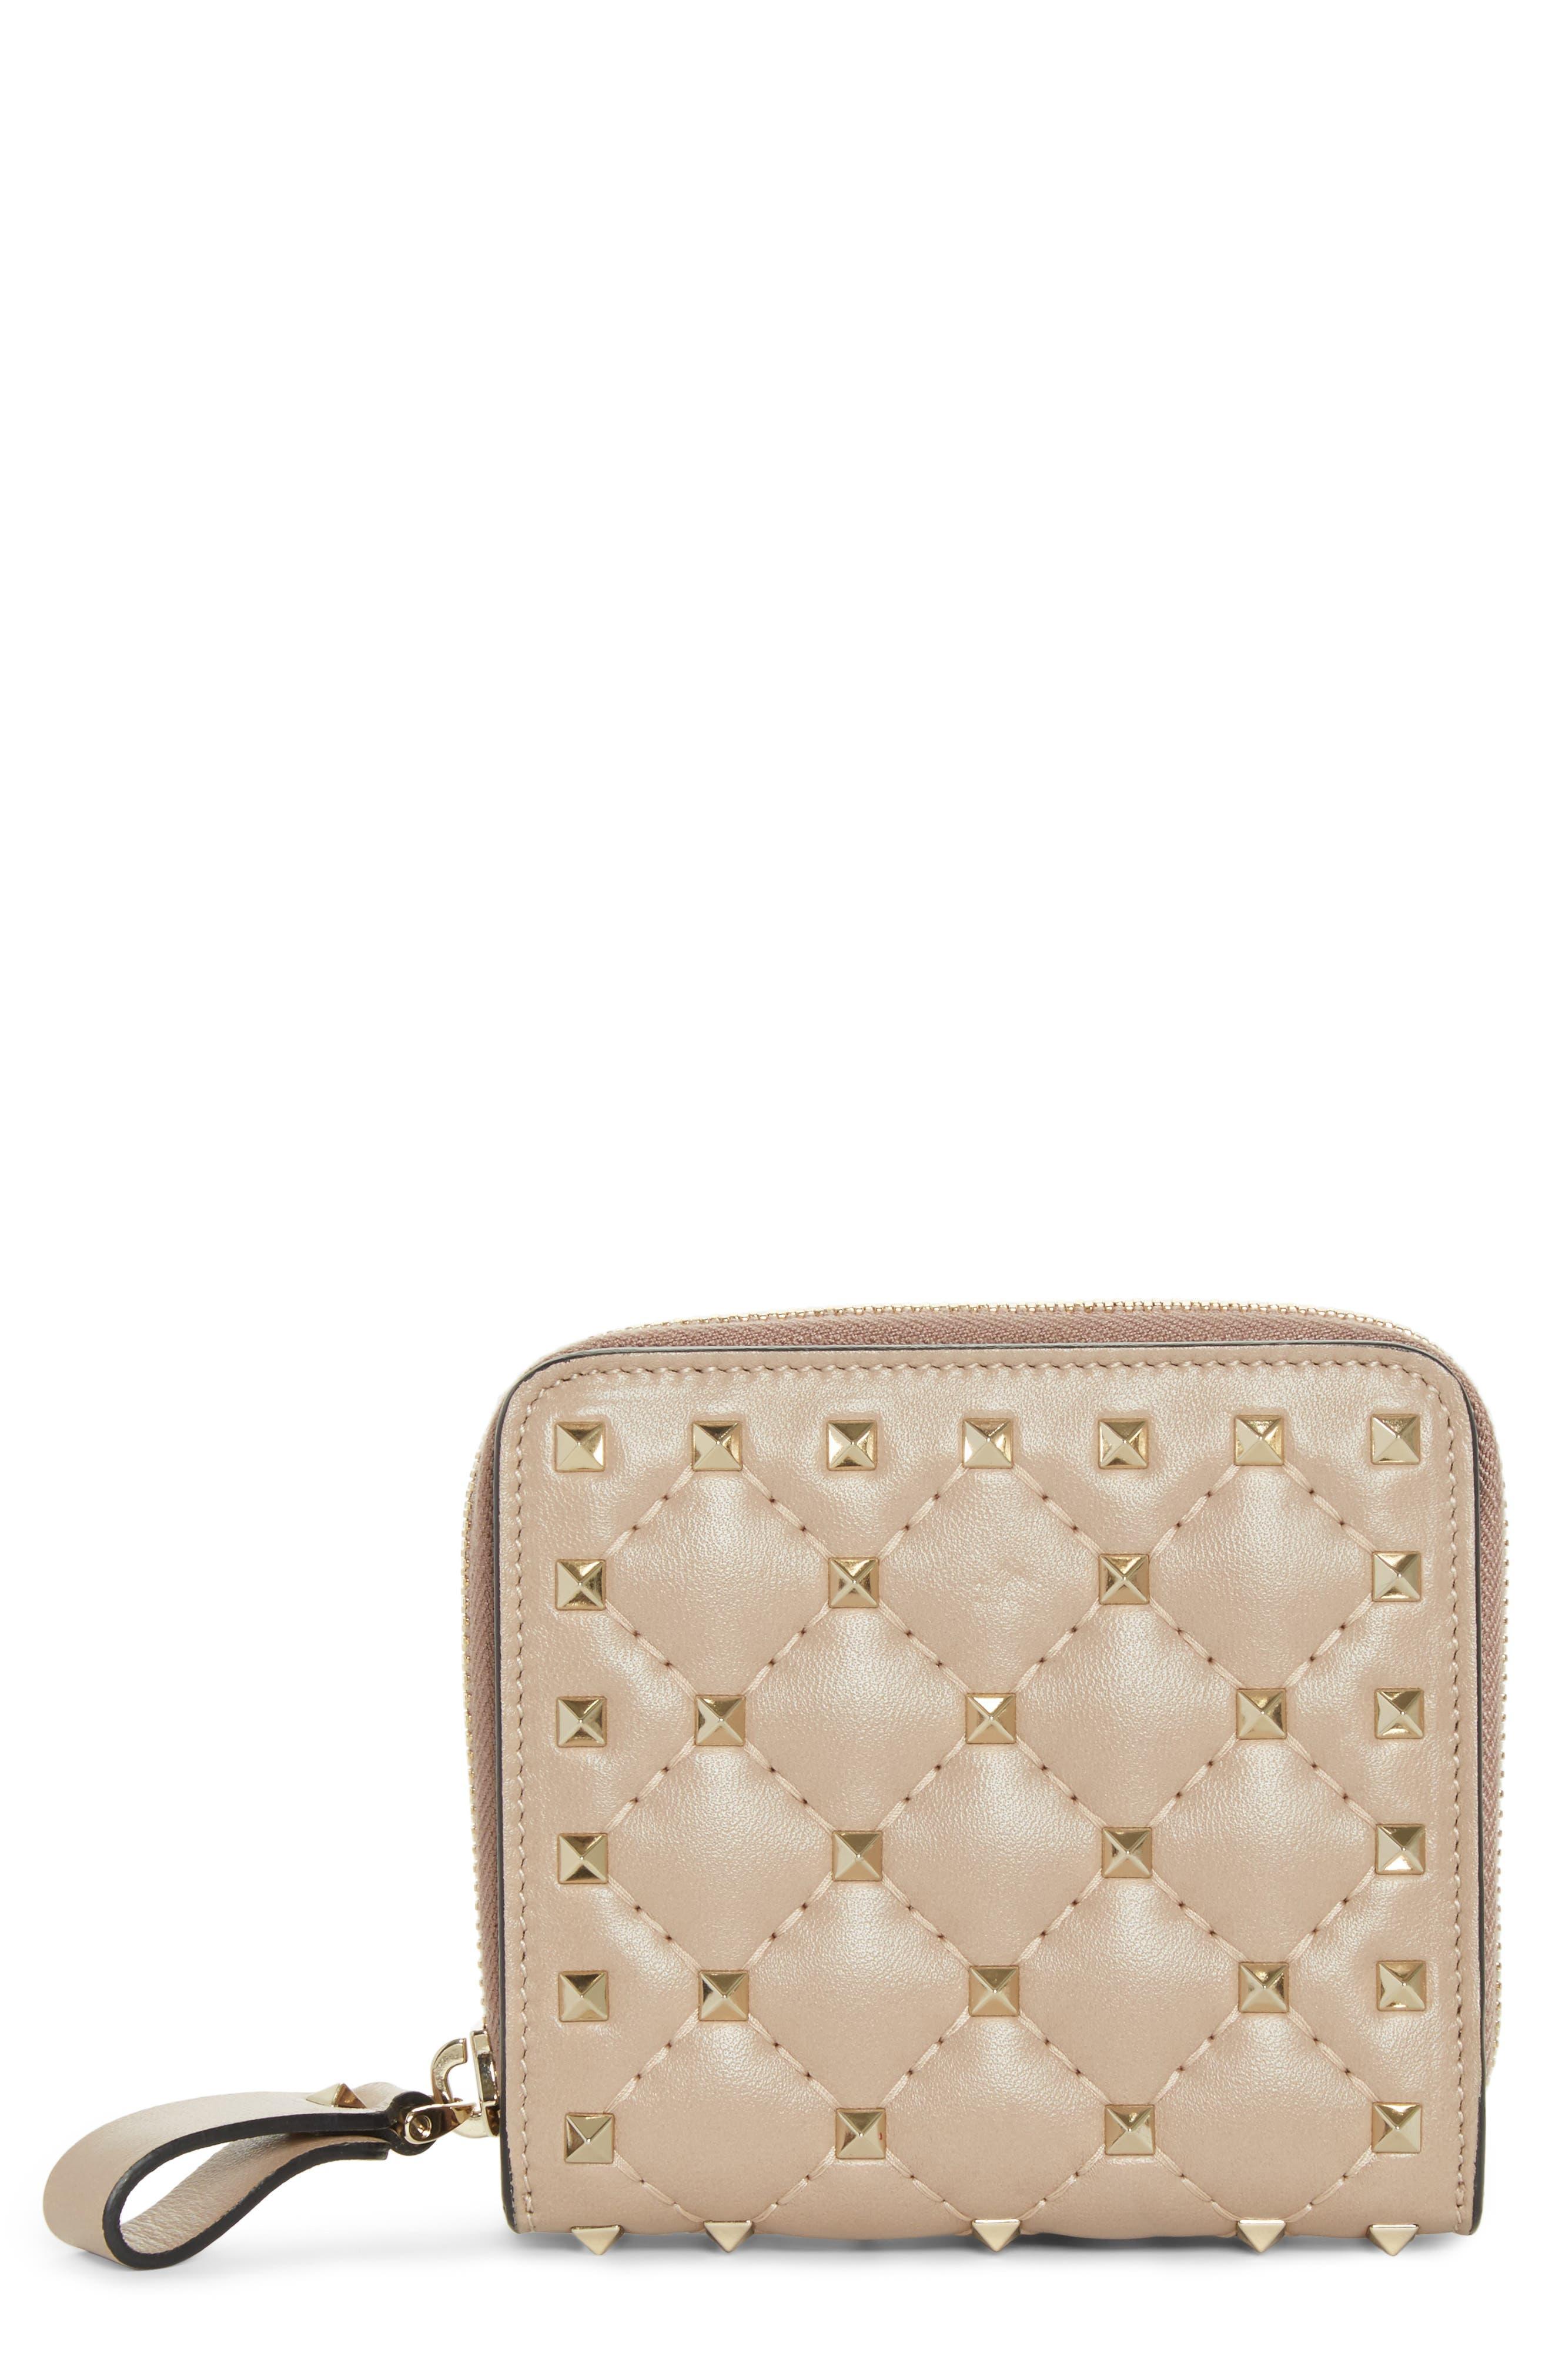 Main Image - VALENTINO GARAVANI Rockstud Matelassé Leather French Wallet